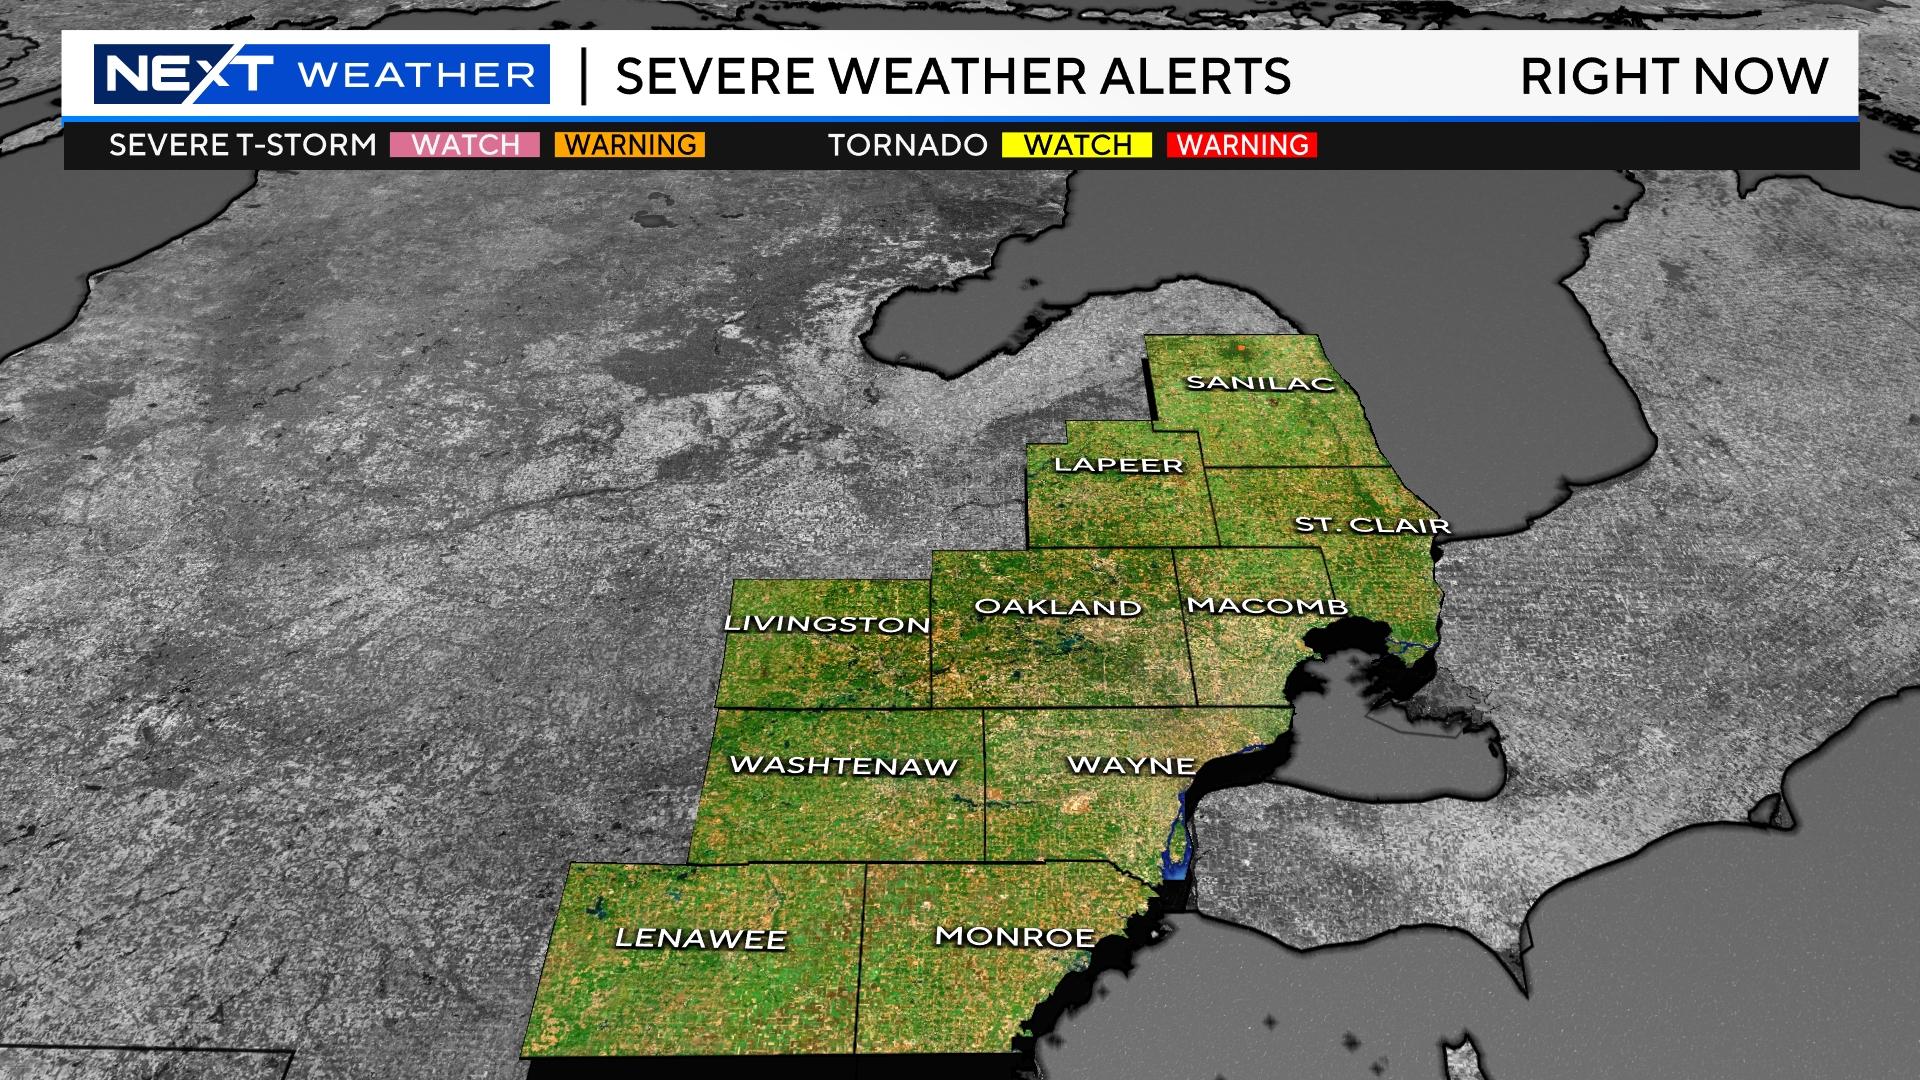 severe warnings spring Severe Storm Warnings